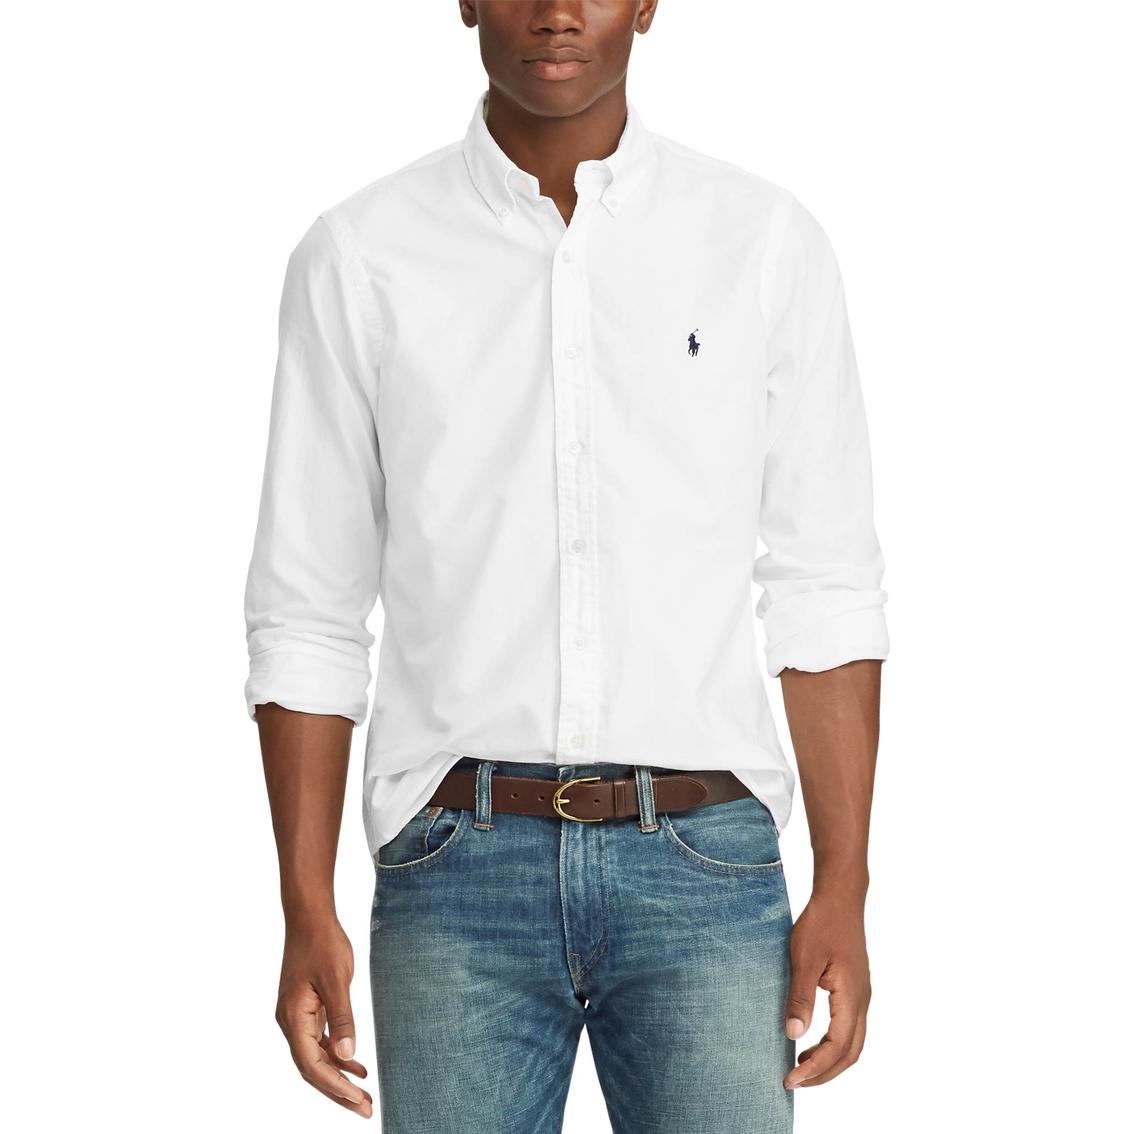 6cd8c8b6 Polo Ralph Lauren Classic Fit Oxford Shirt | Casual | Apparel | Shop ...